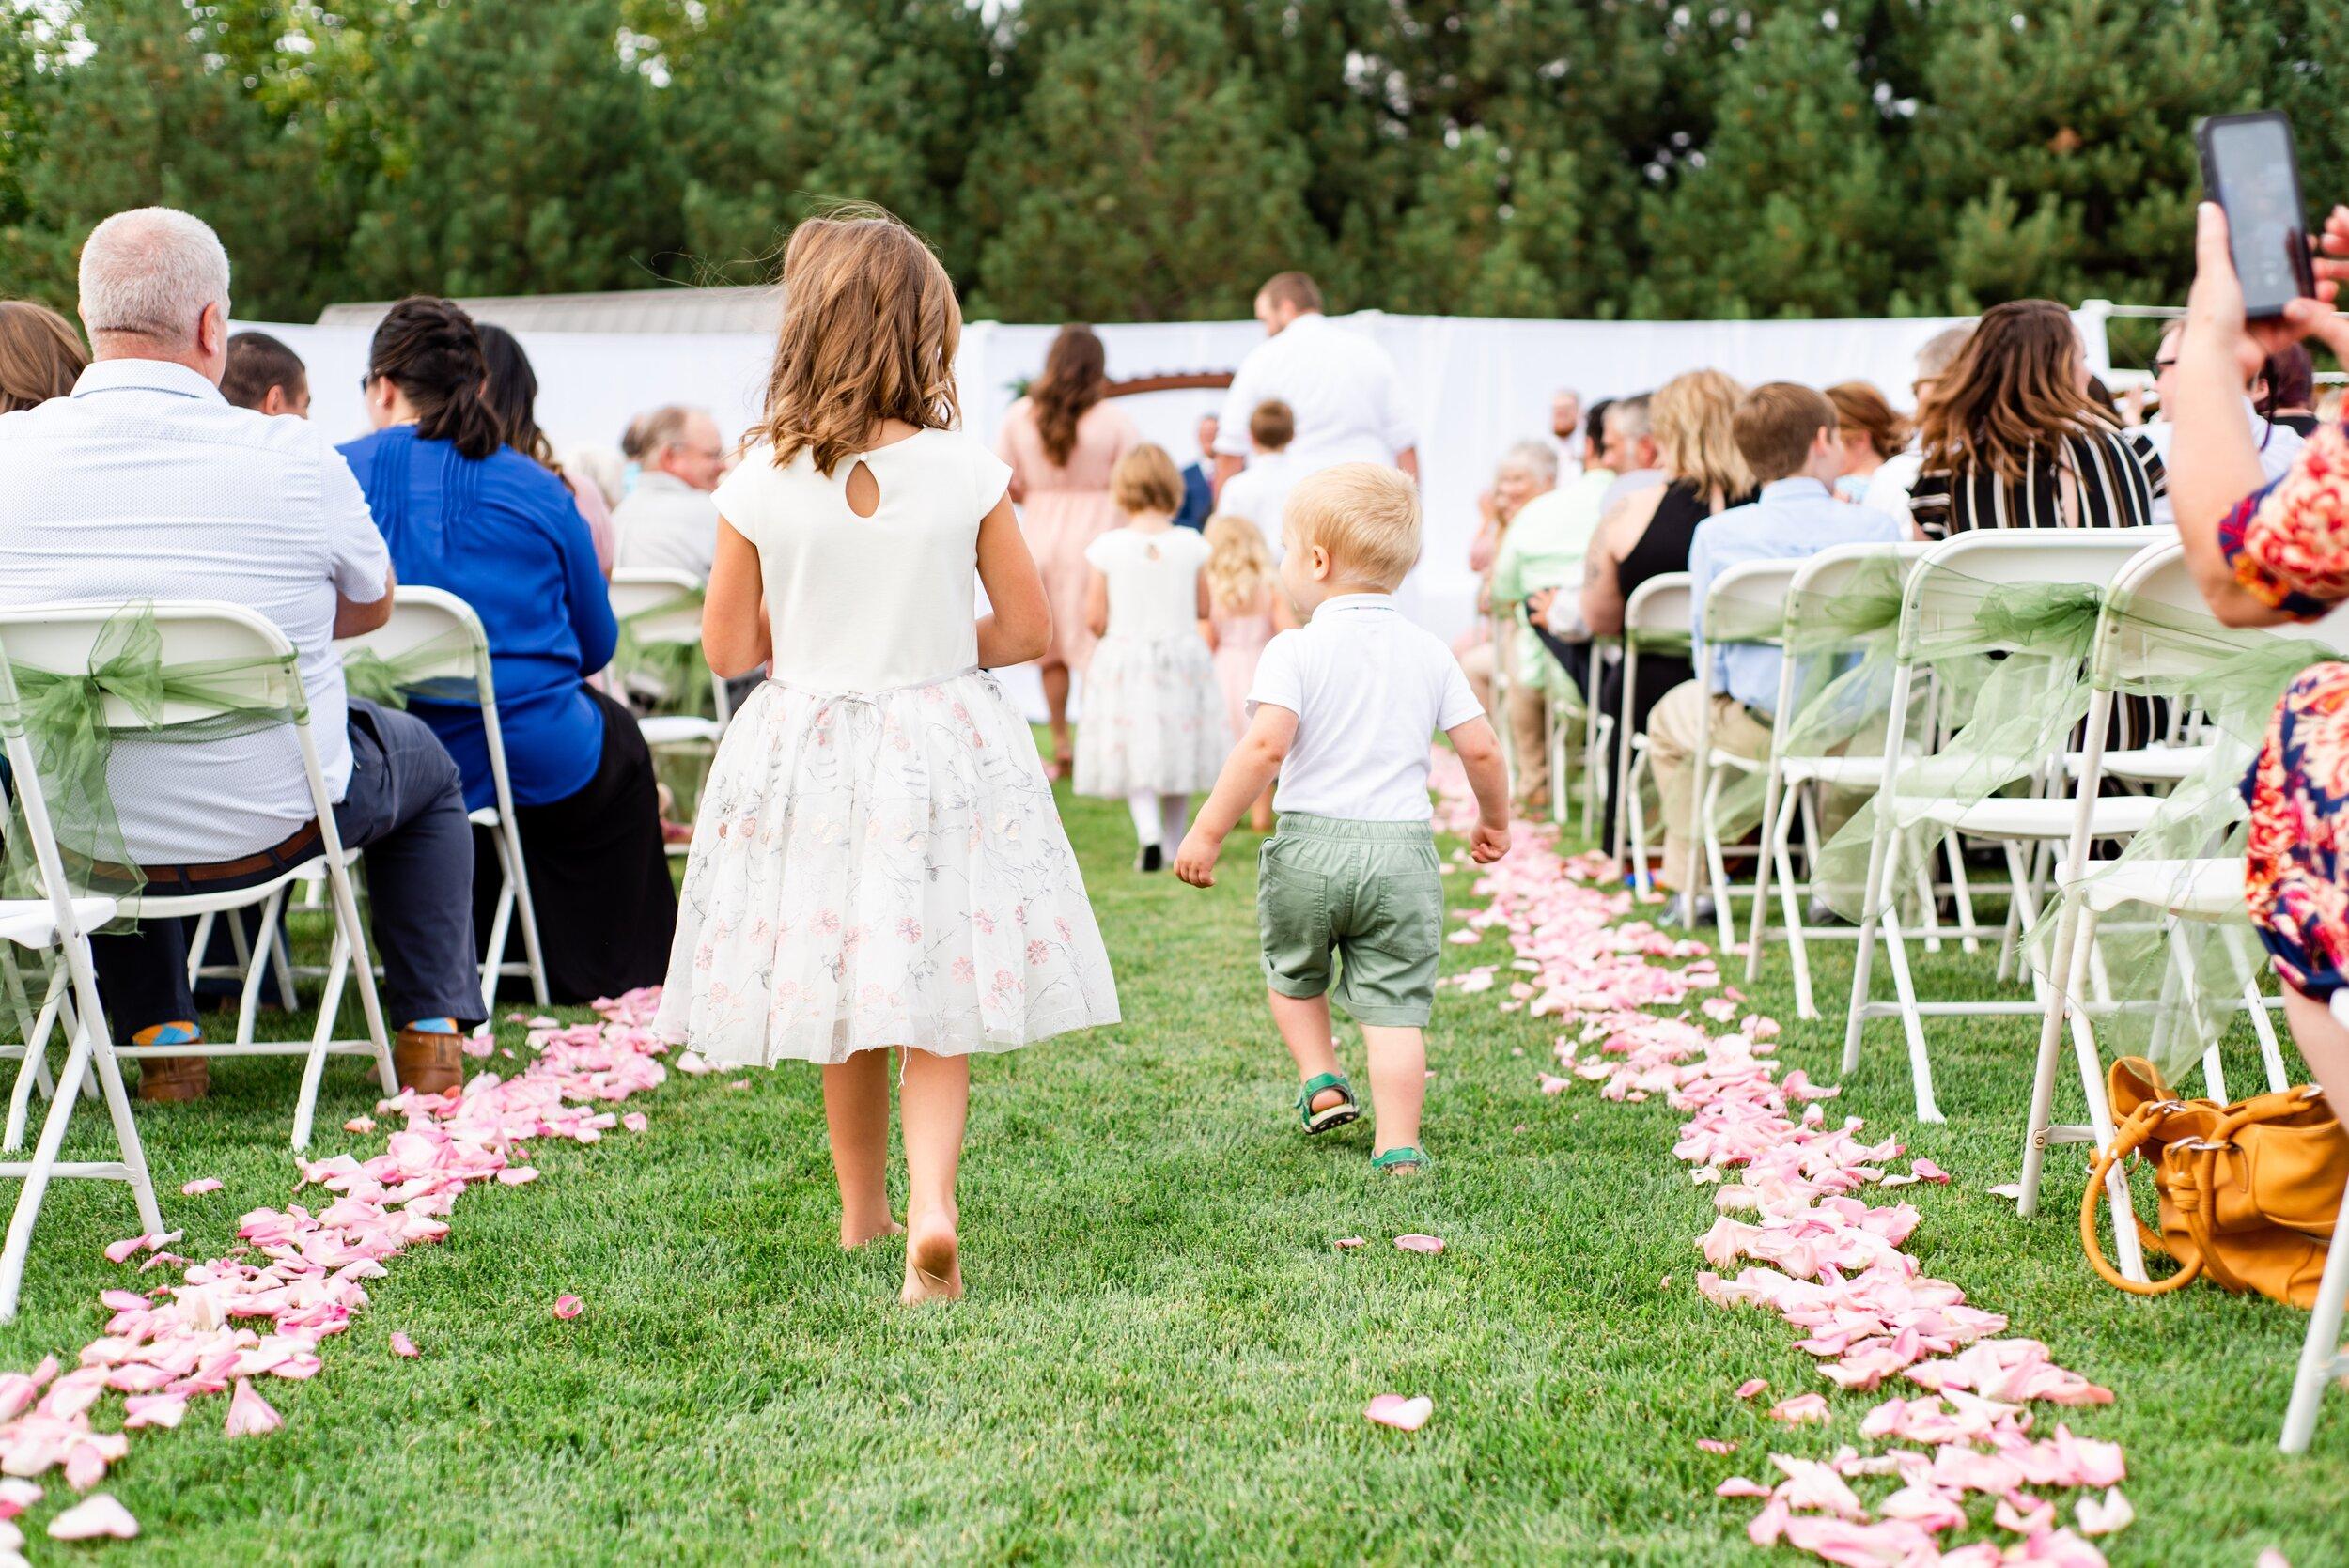 Flower Girl & Ring Bearer Walking Up Aisle - Tri Cities Wedding Photographer - Morgan Tayler Photo & Design - Tri Cities Washington Backyard Wedding